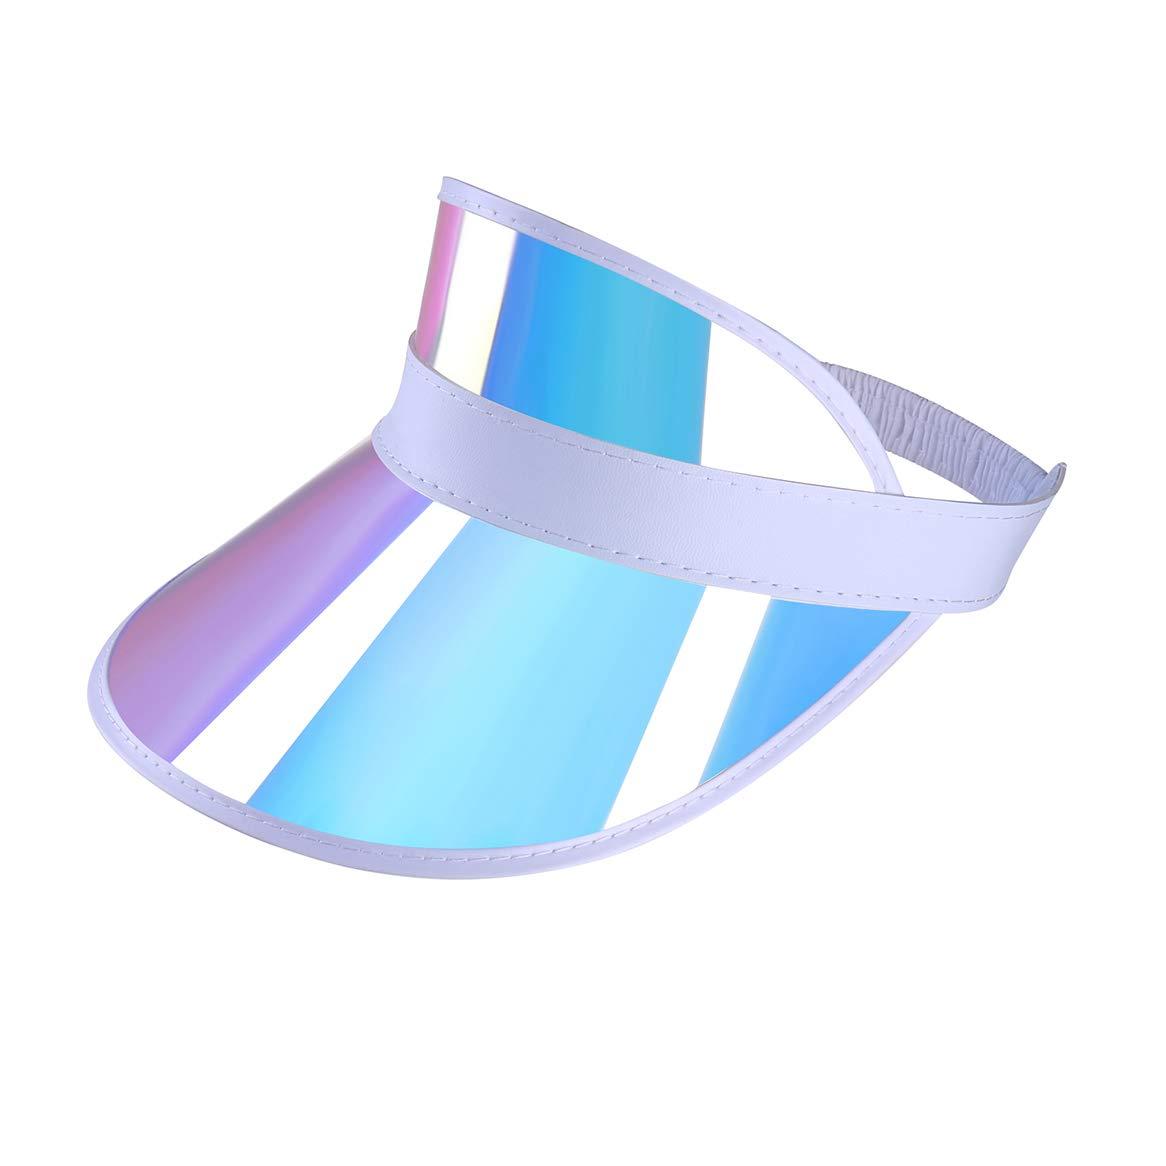 Iridescent Plastic Sun-Visor Hats UV-Shield Protection Hat Tennis-Viosr-Mirrored